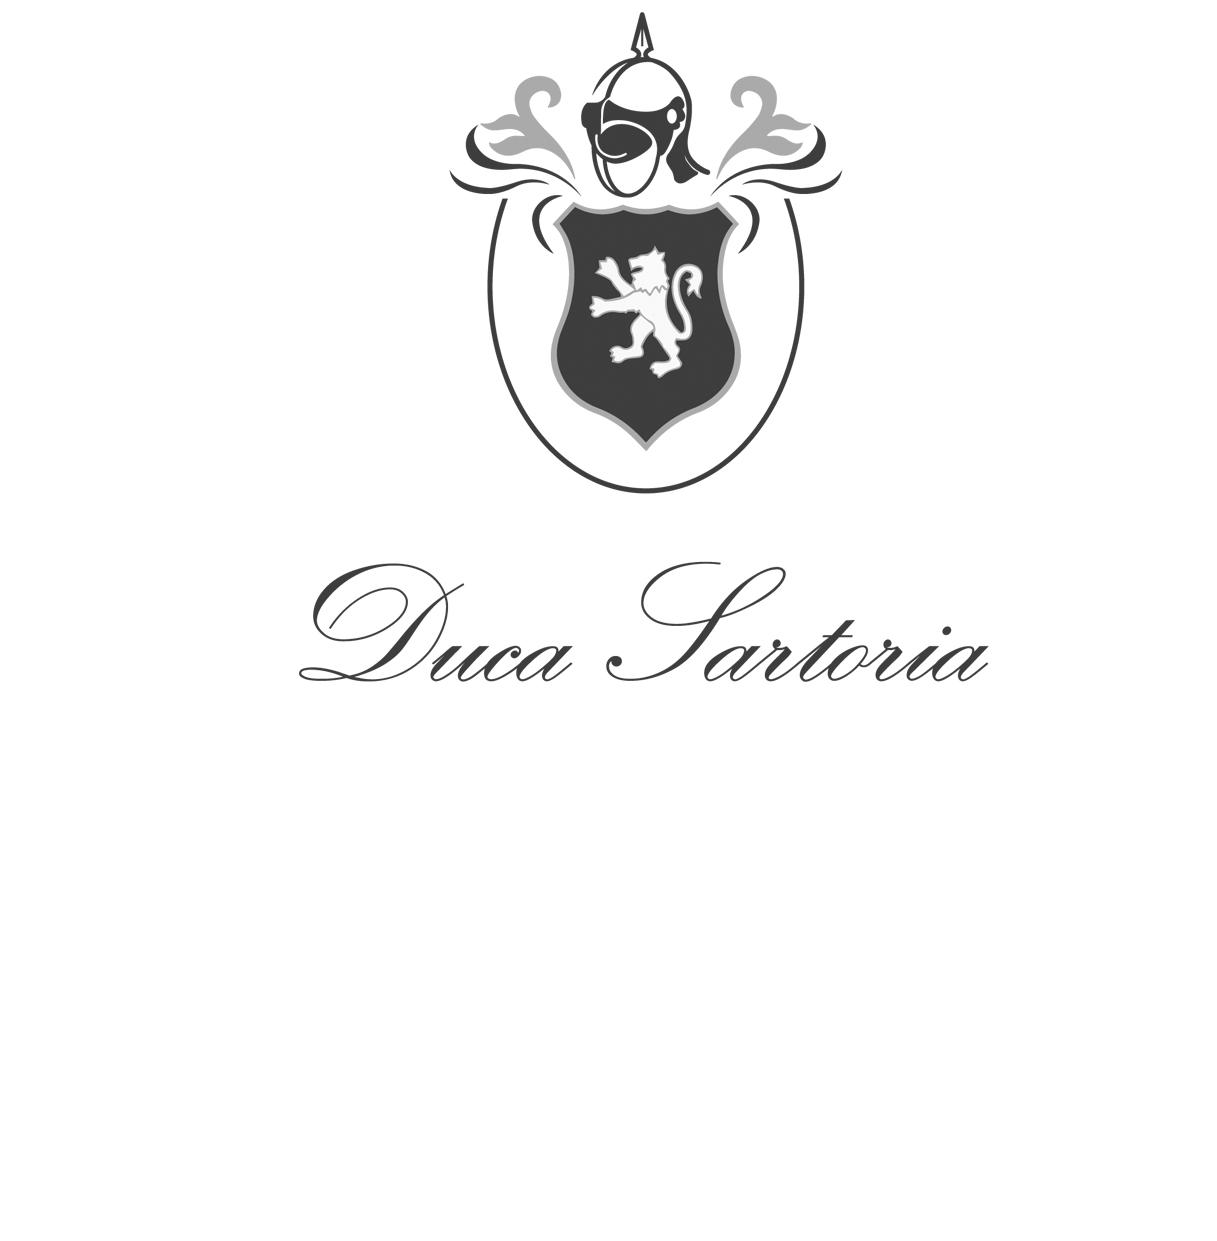 http://www.capitalshop.it/media/manufacturer/duca-sartoria4.jpg